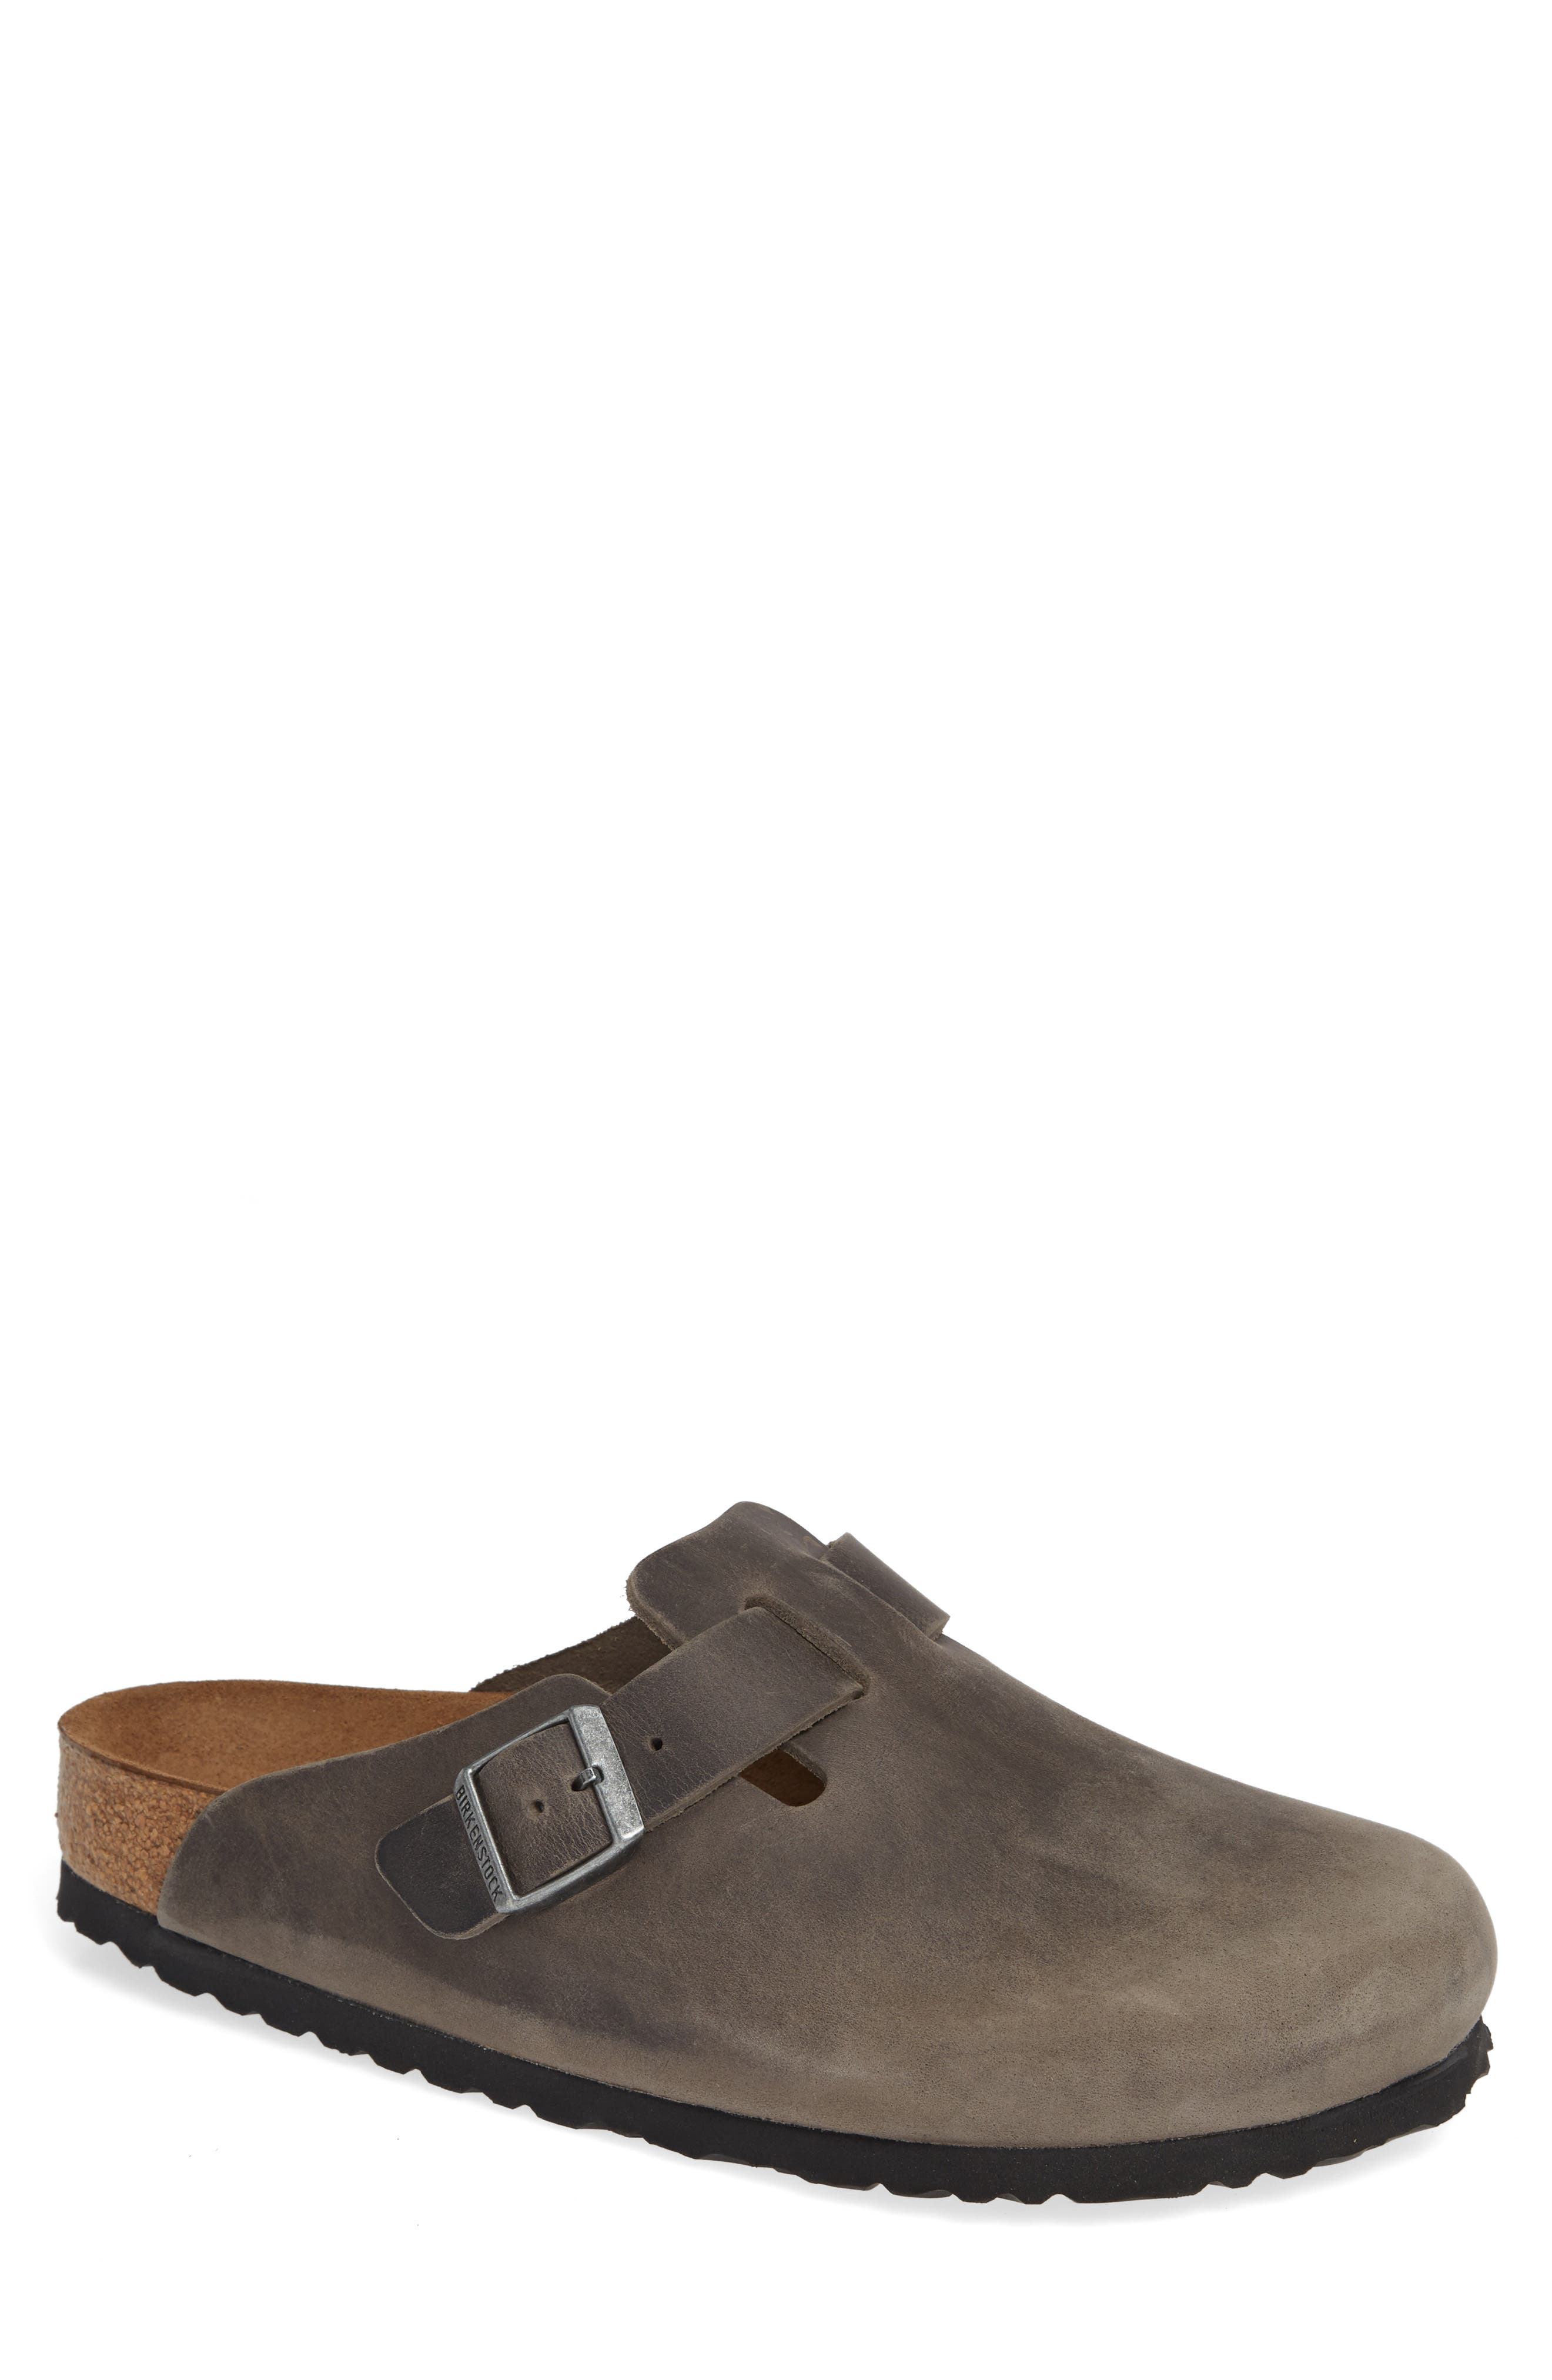 Birkenstock Boston Soft Clog,8.5 - Grey